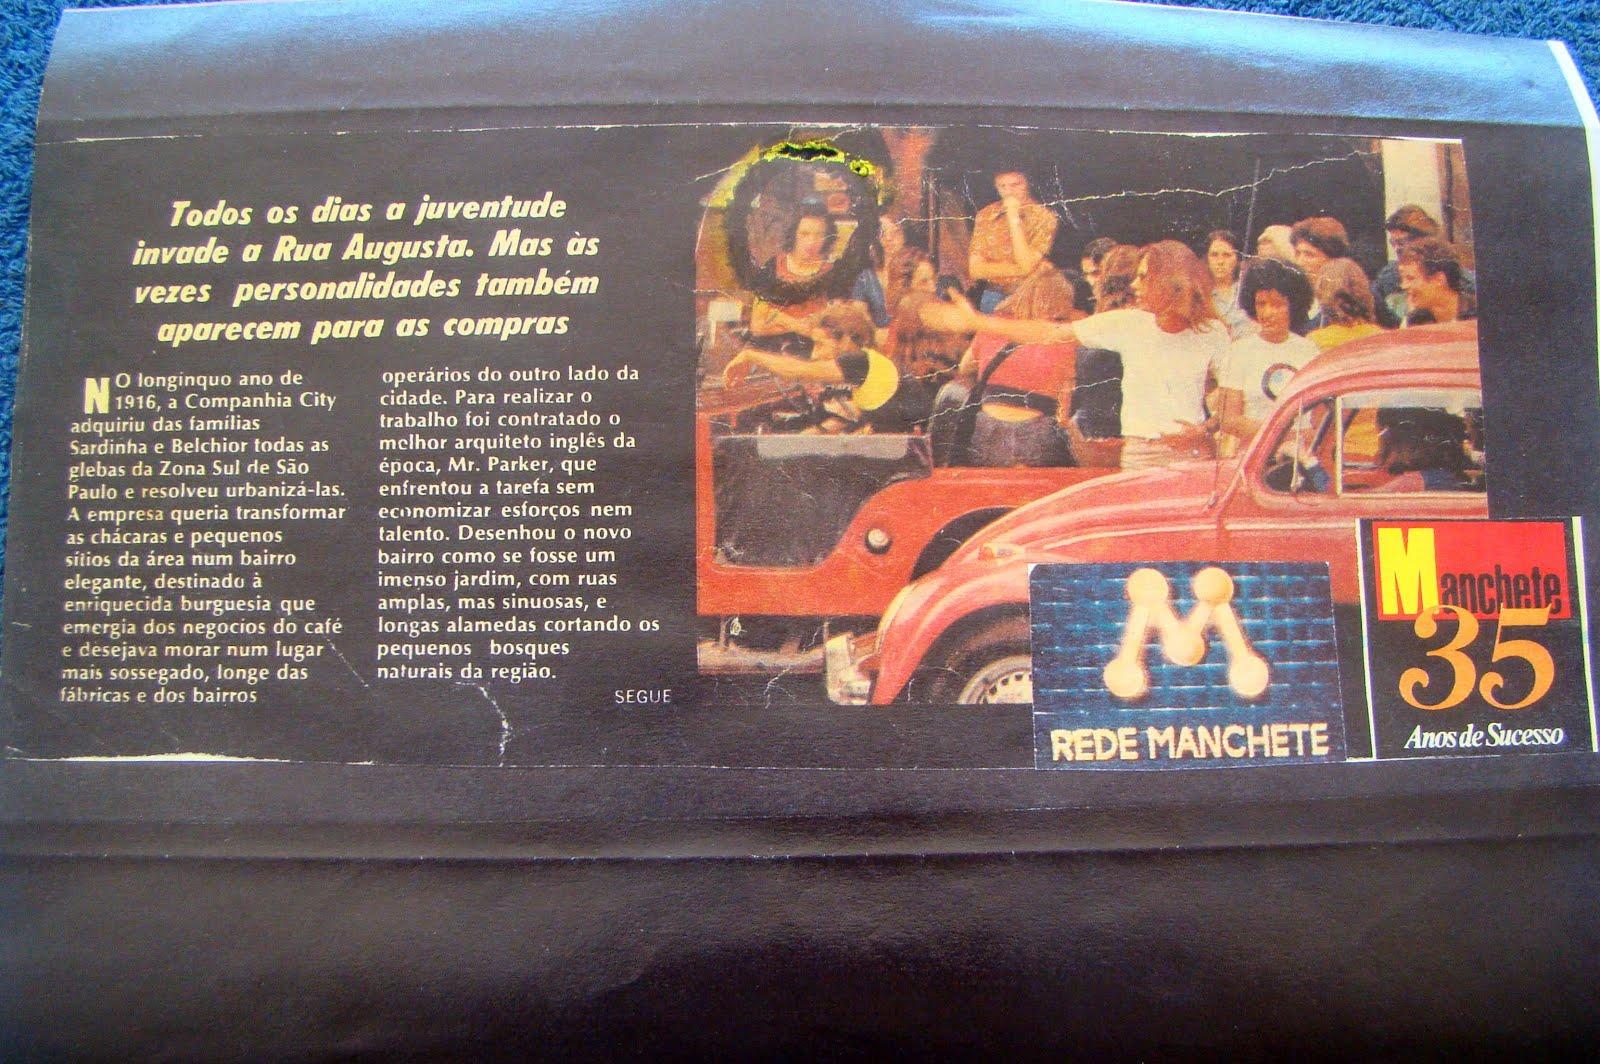 Revista Manchete - Rua Augusta